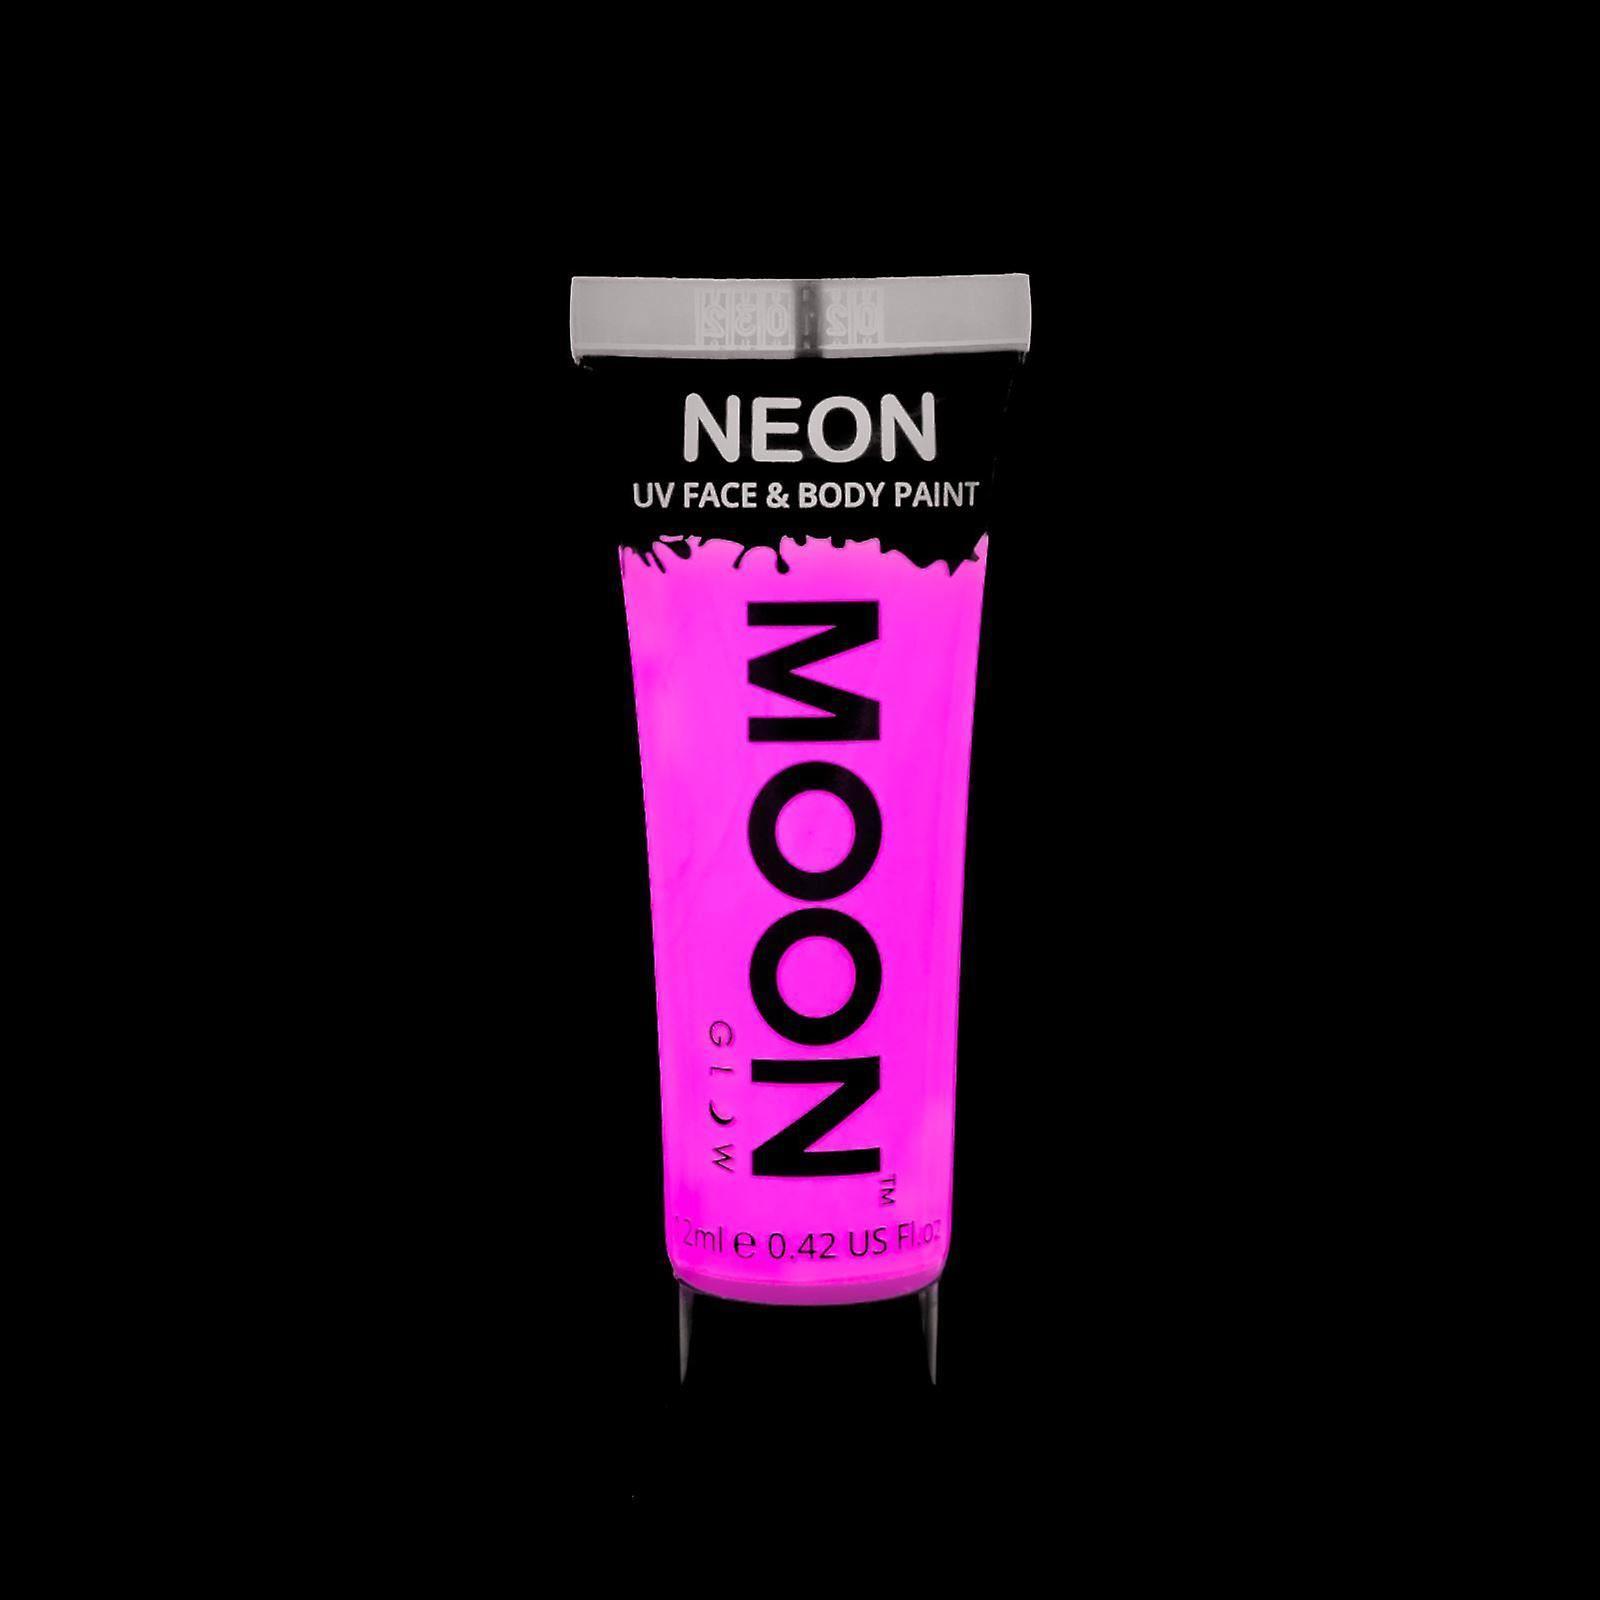 Moon Glow - 12ml Neon UV Face & Body Paint - Pastel Pink